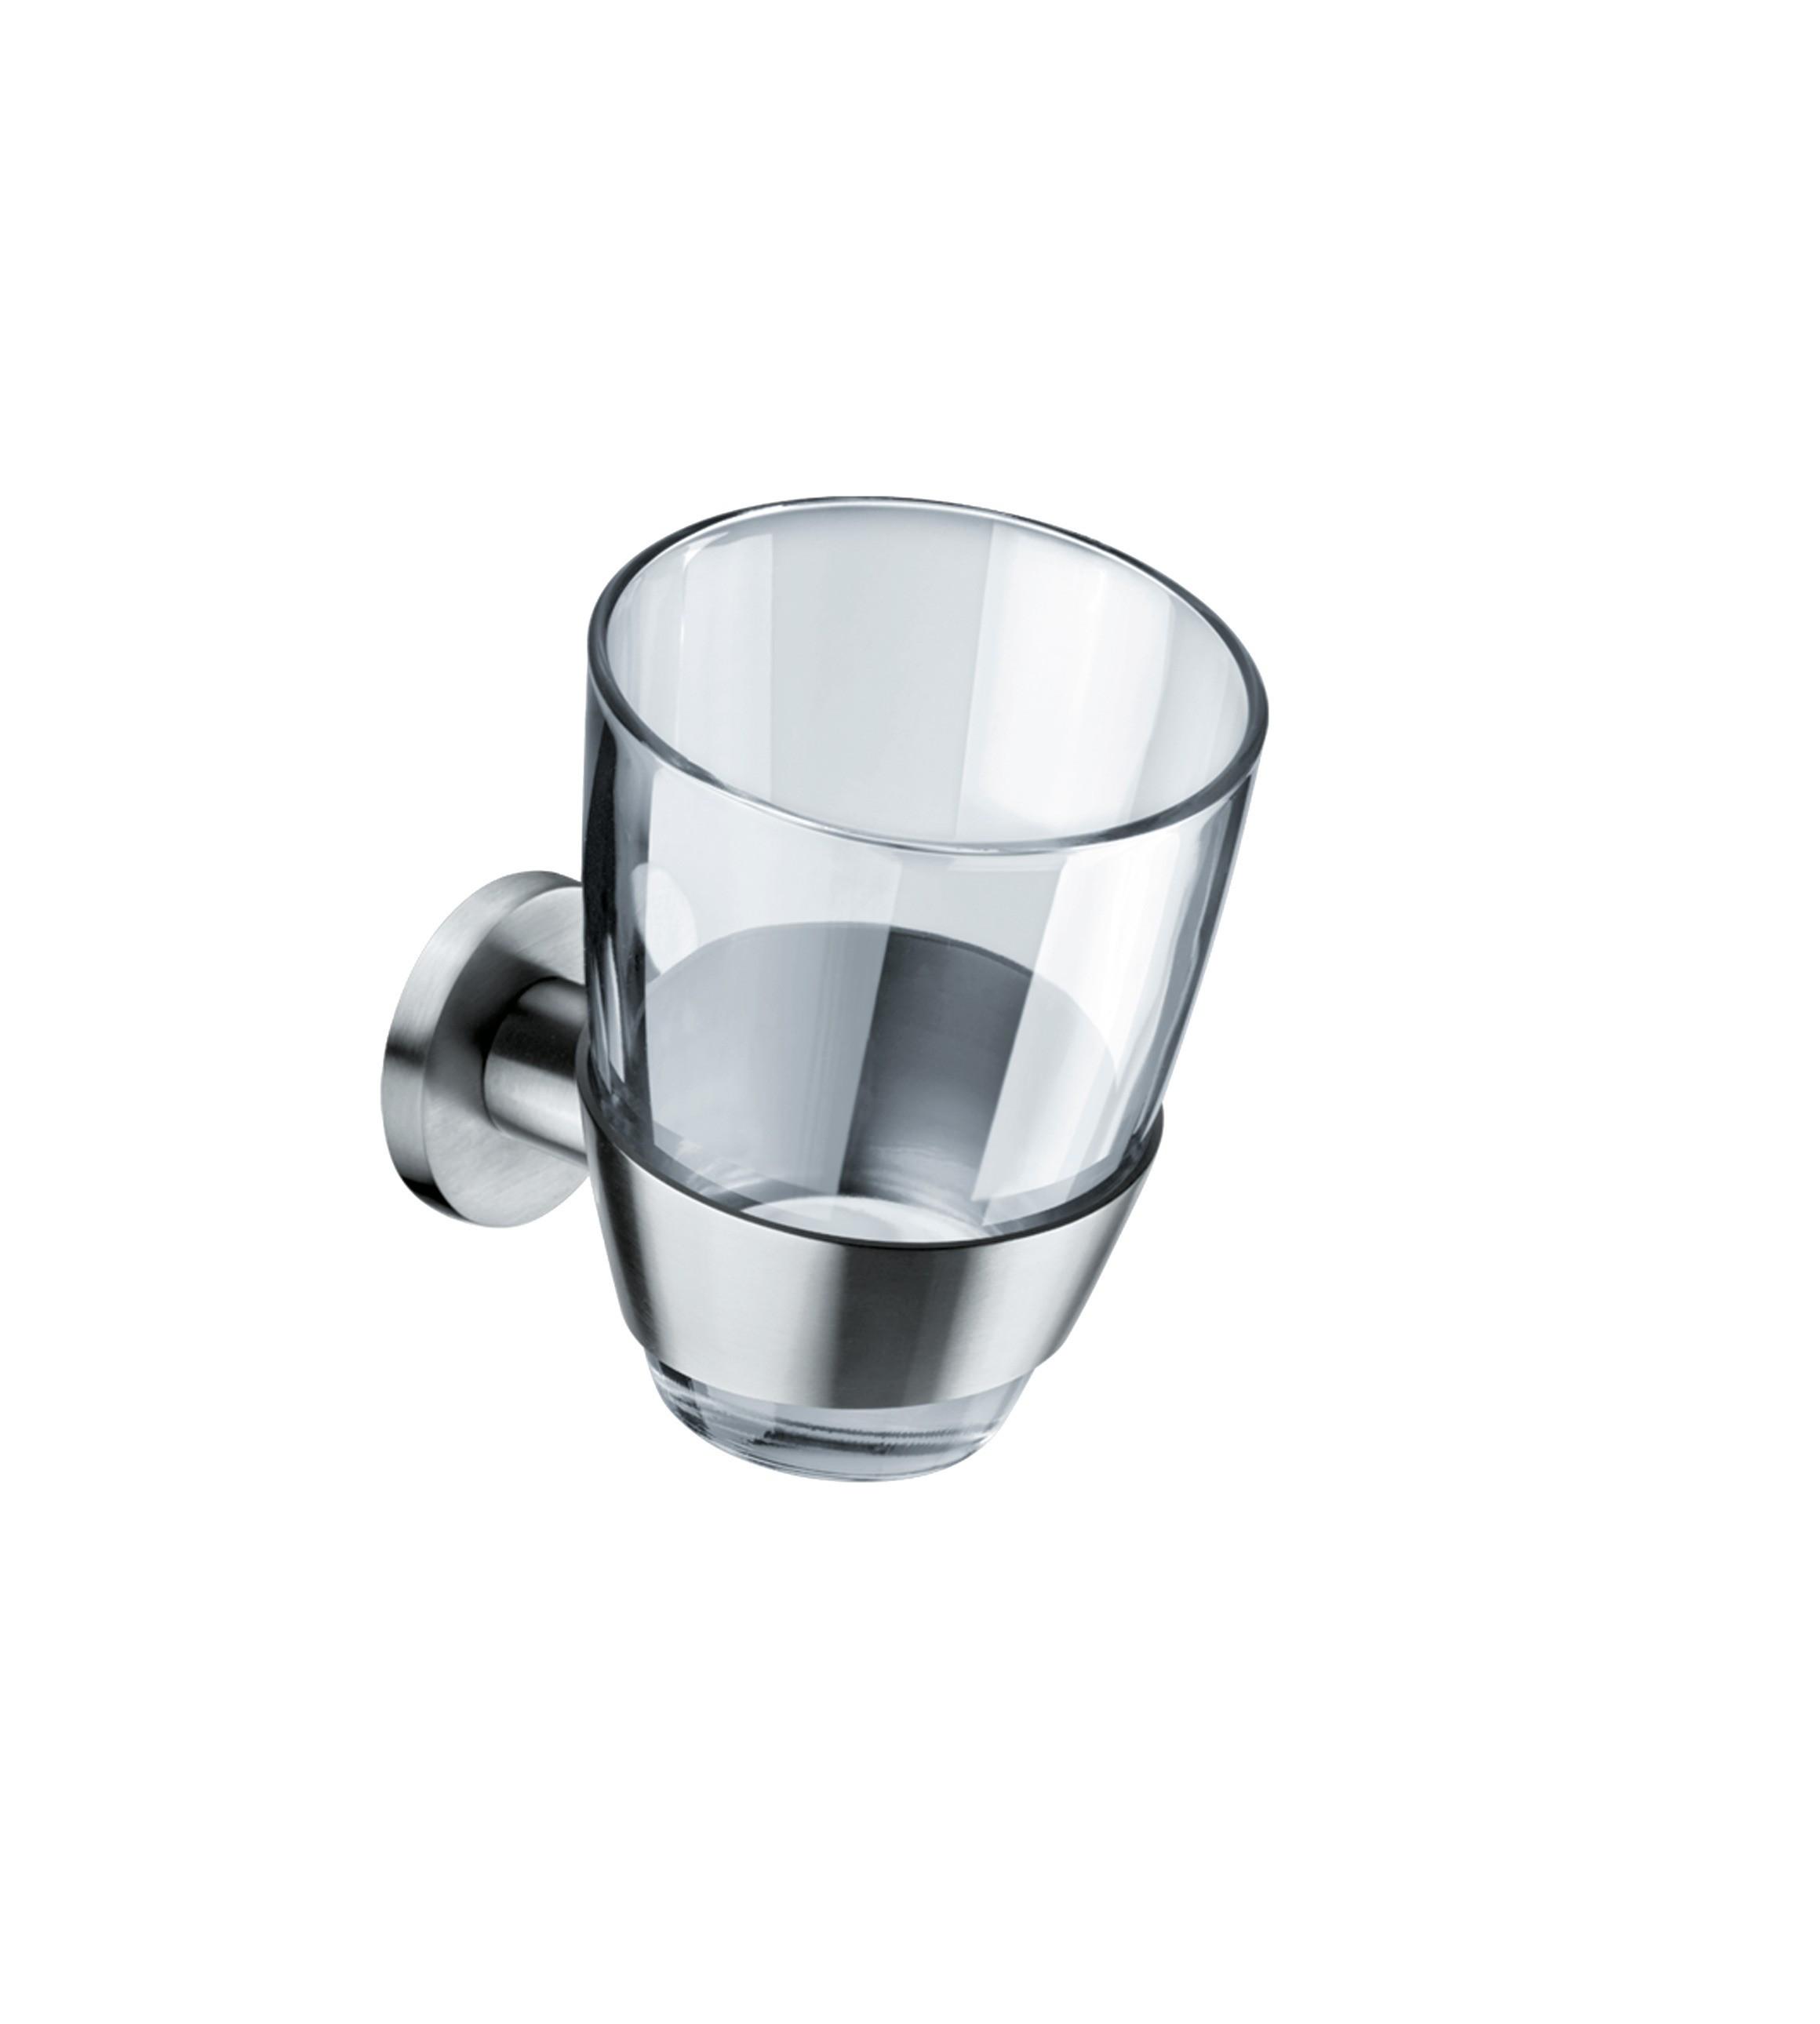 FSB Glashalter mit Glasbecher Glasbecher Metric Klebetechnik Edelstahl polinksert(0 82 8270 08041 6205)